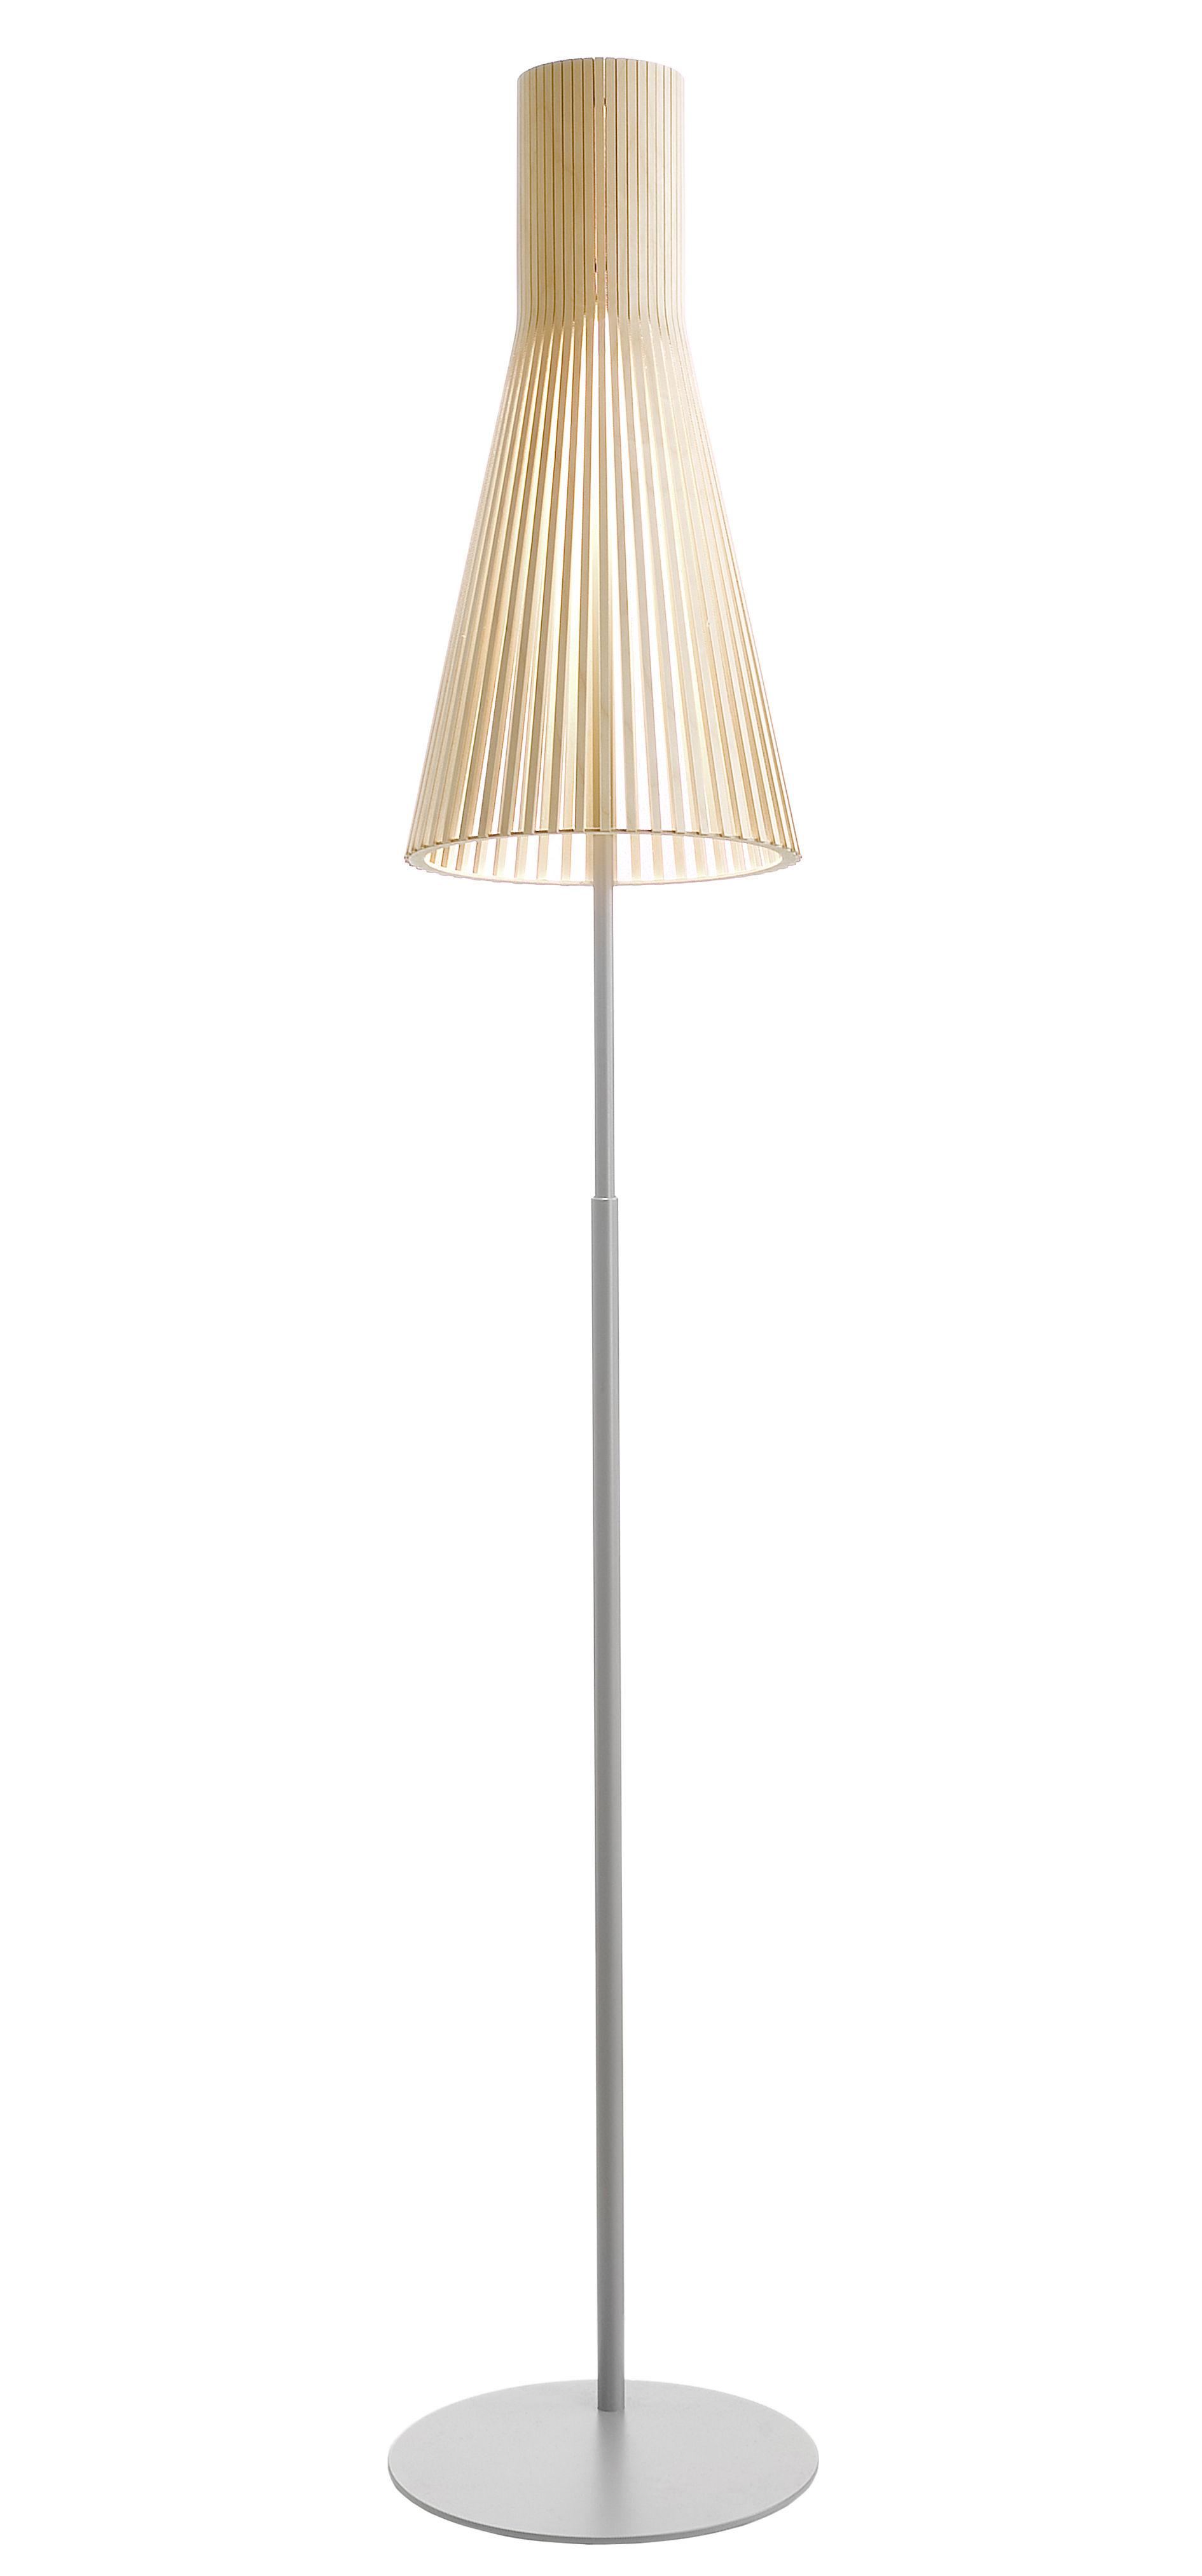 Lighting - Floor lamps - Secto Floor lamp - / H adjustable 175 to 185 cm by Secto Design - Natural birch / Light grey structure - Birch slats, Metal